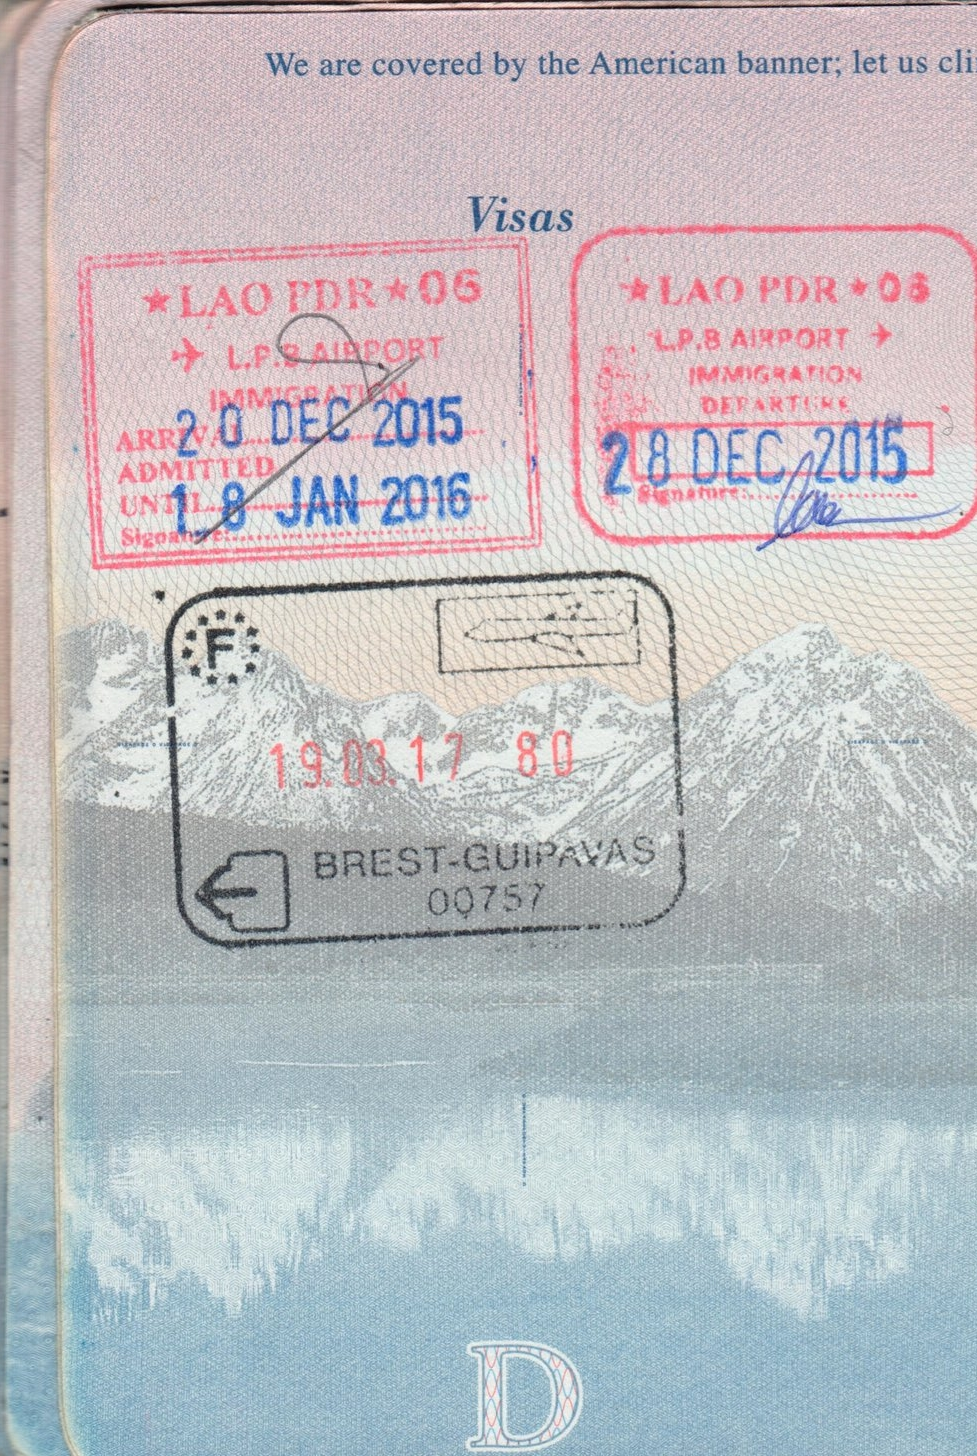 Laos & Brest, France Passport Stamps